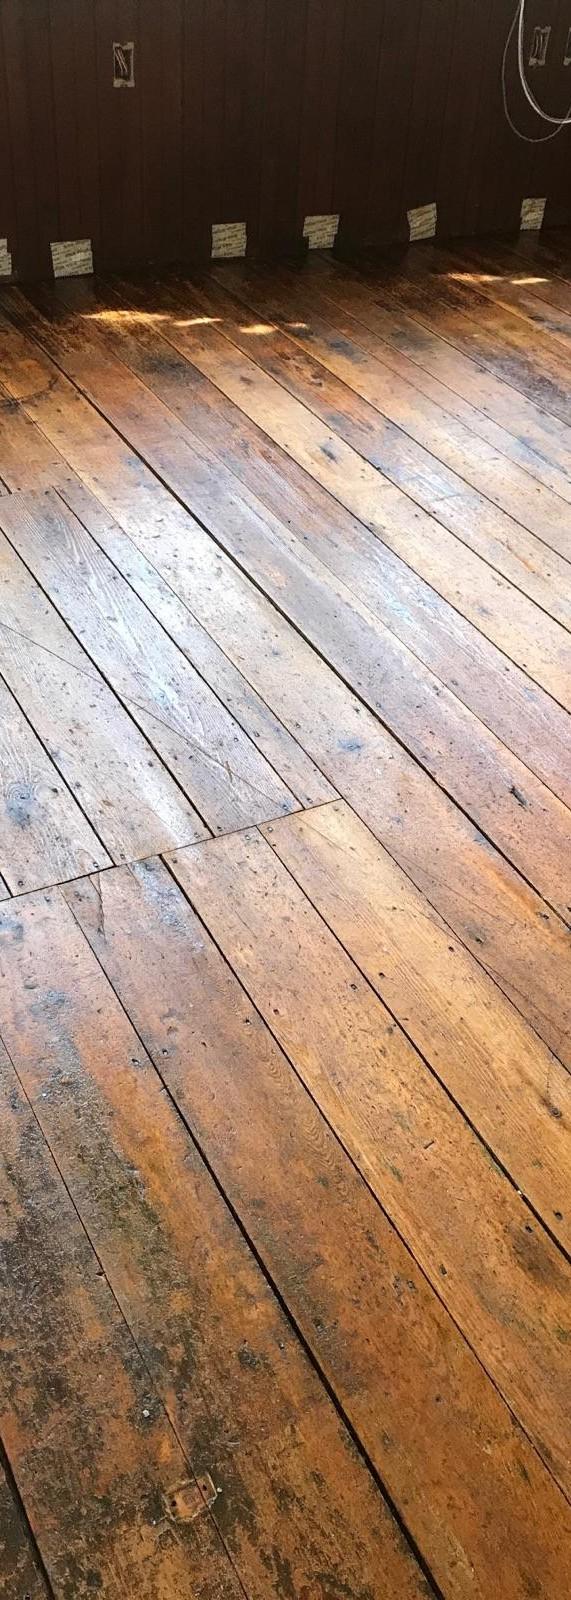 150 year old pine floors